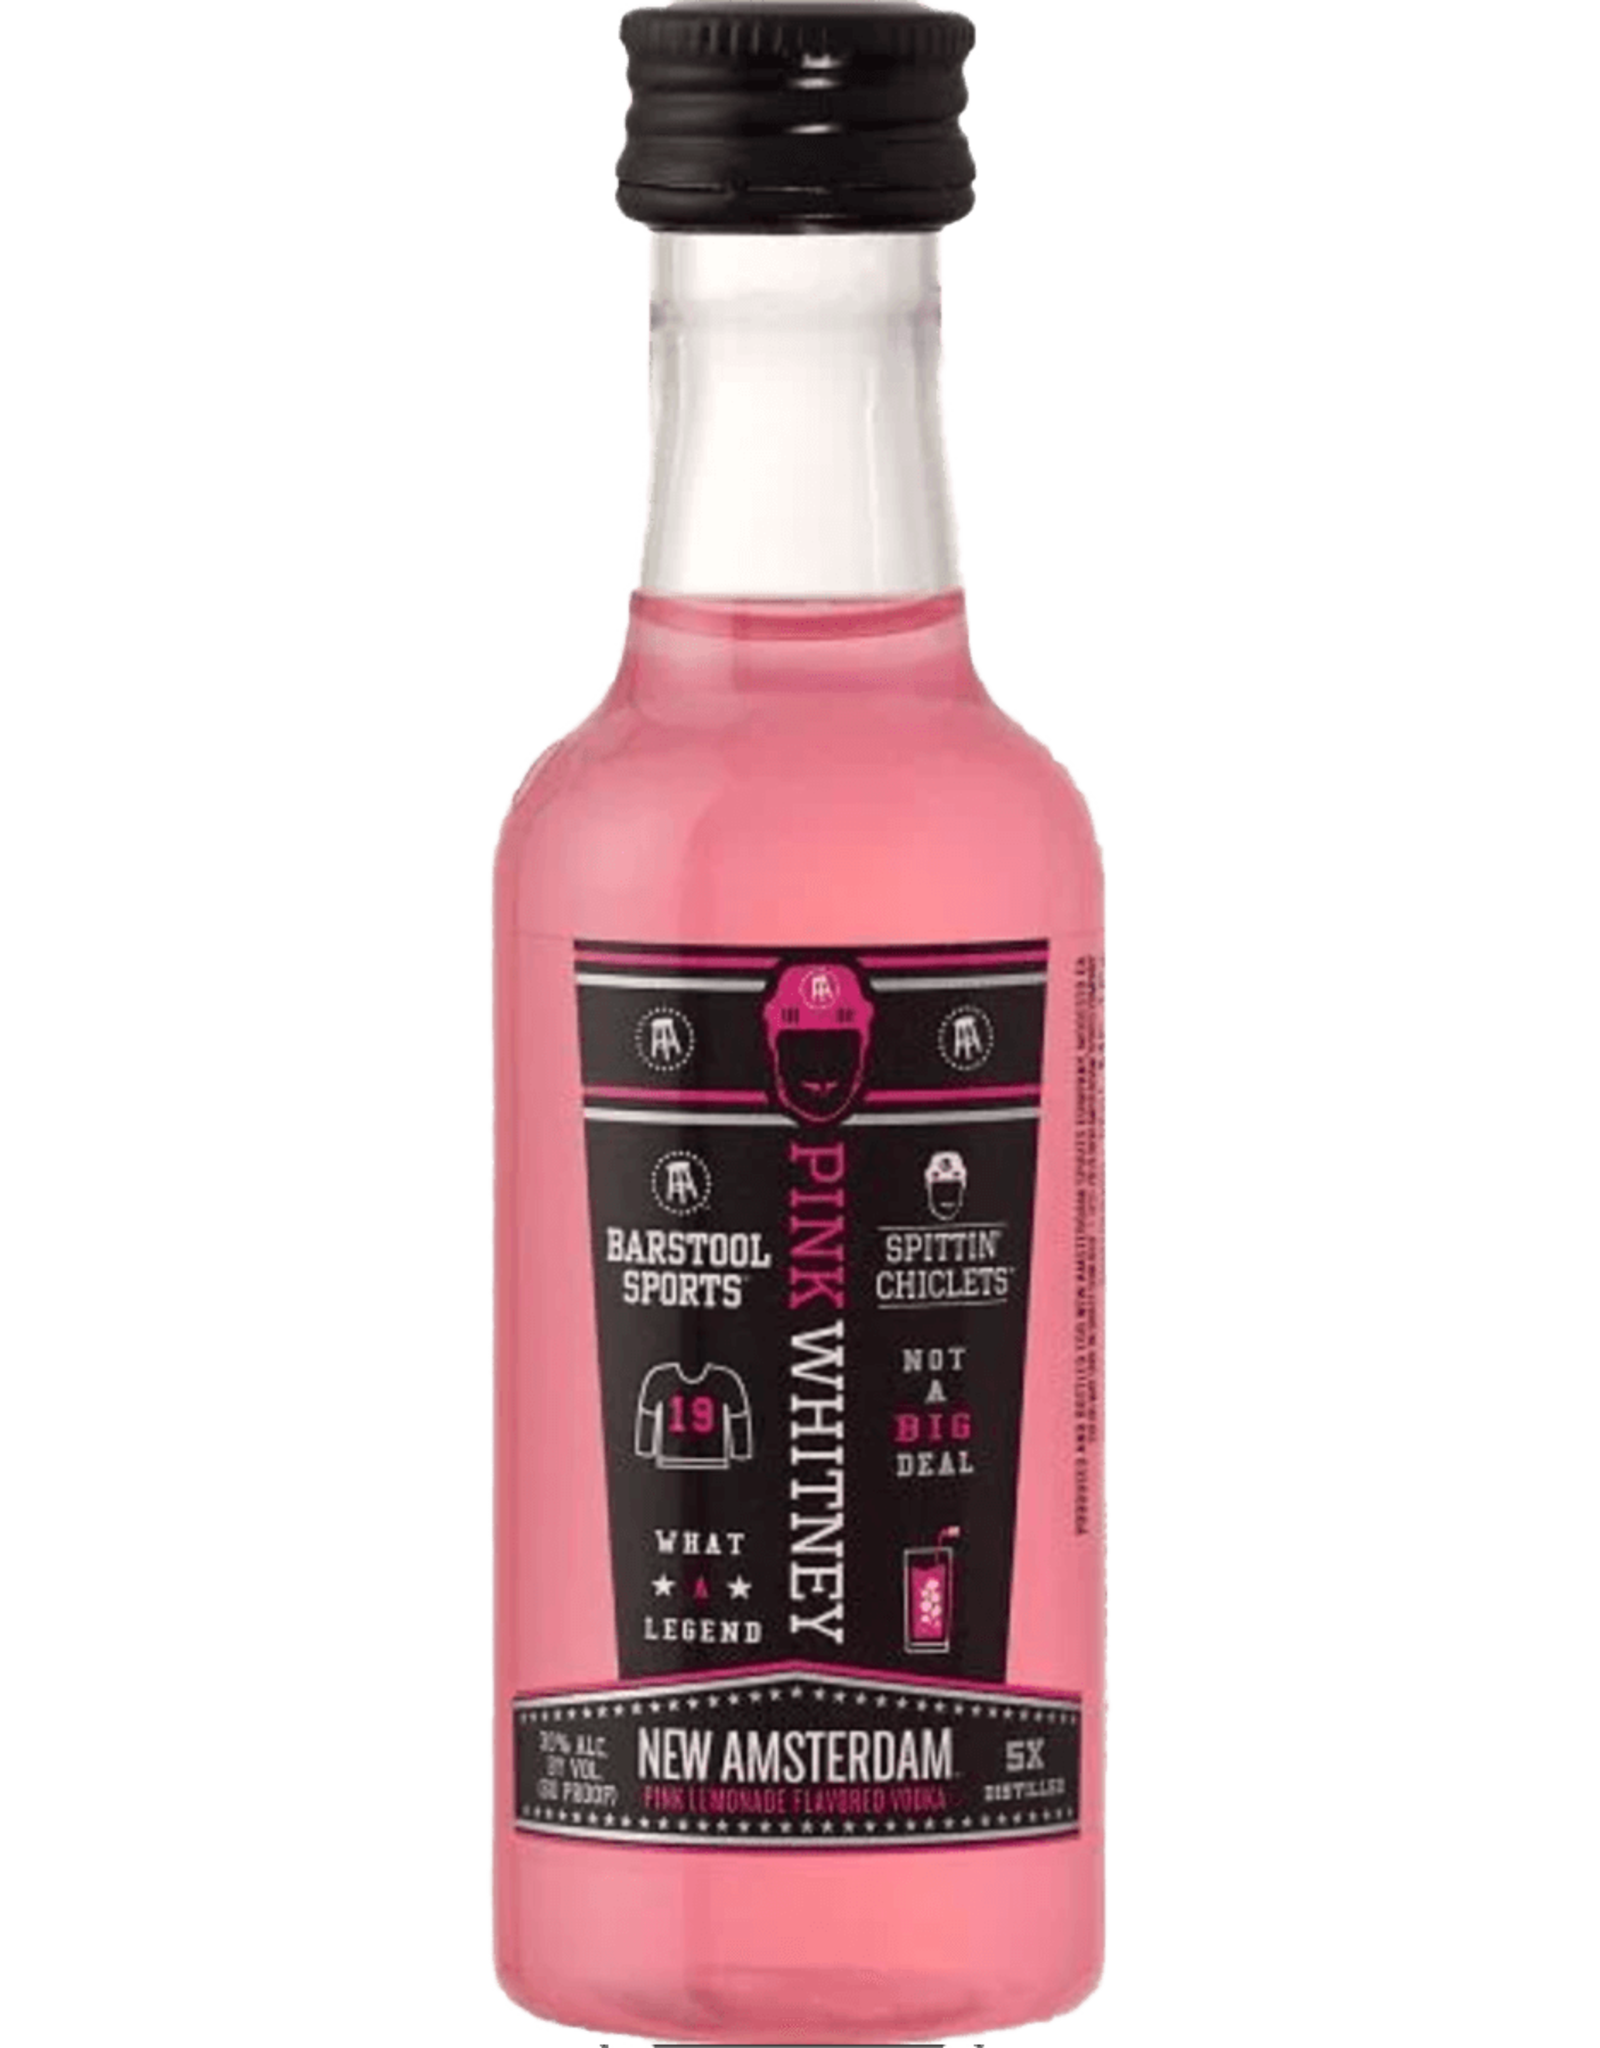 New Amsterdam Pink Whitney Pink Lemonade Vodka 50ml